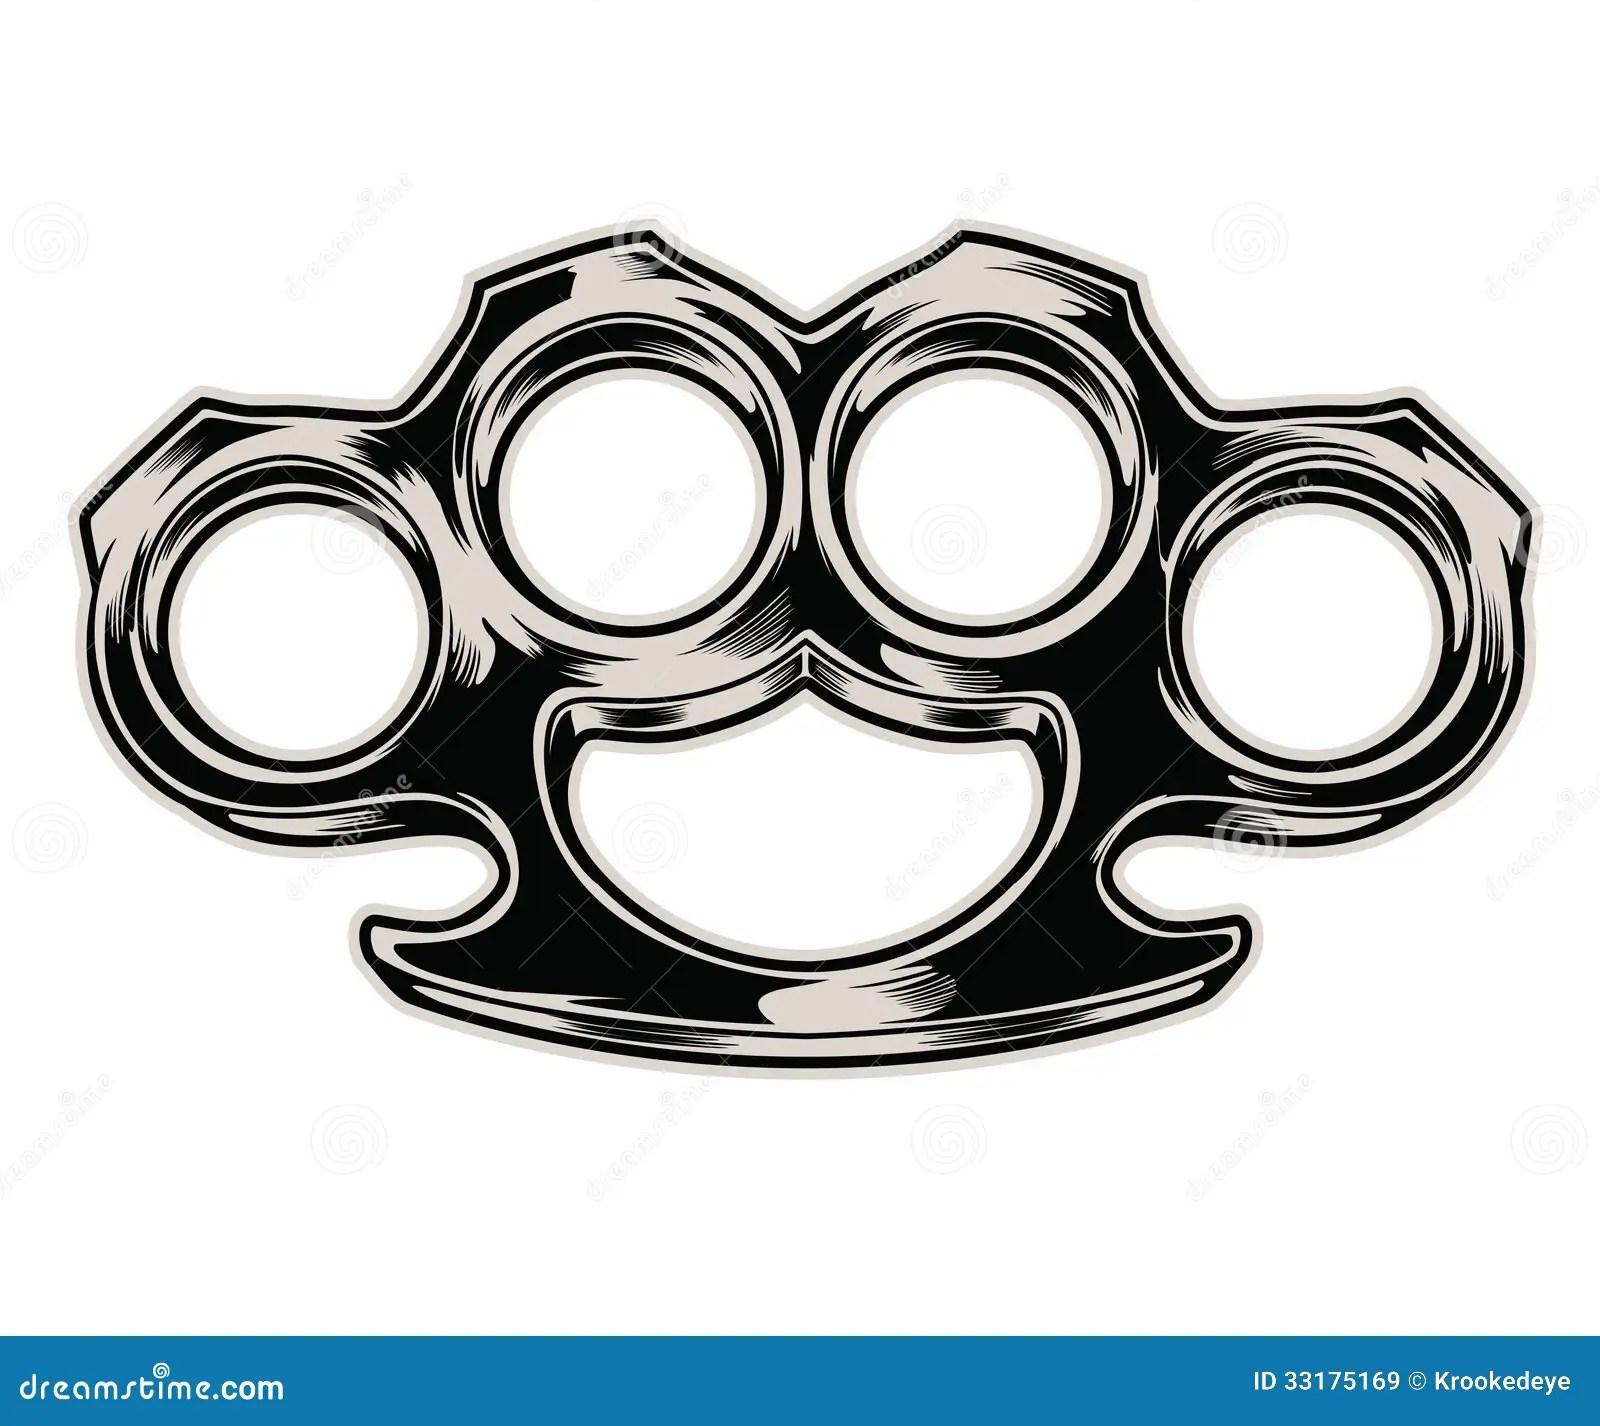 Brass knuckles stock vector Illustration of gear danger